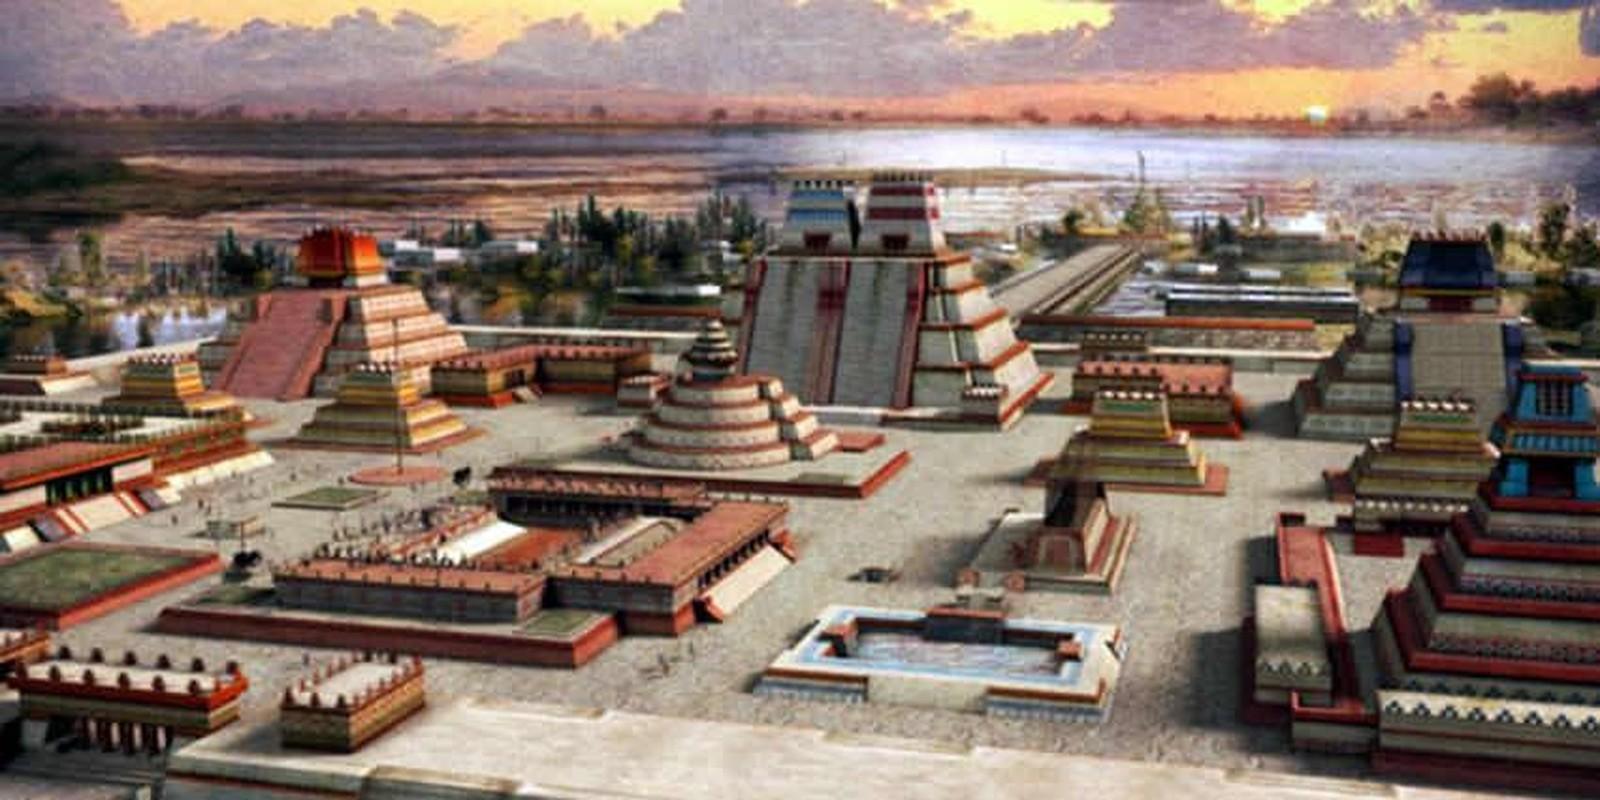 Loi tien tri ly ky ve kinh do cua de che Aztec-Hinh-5